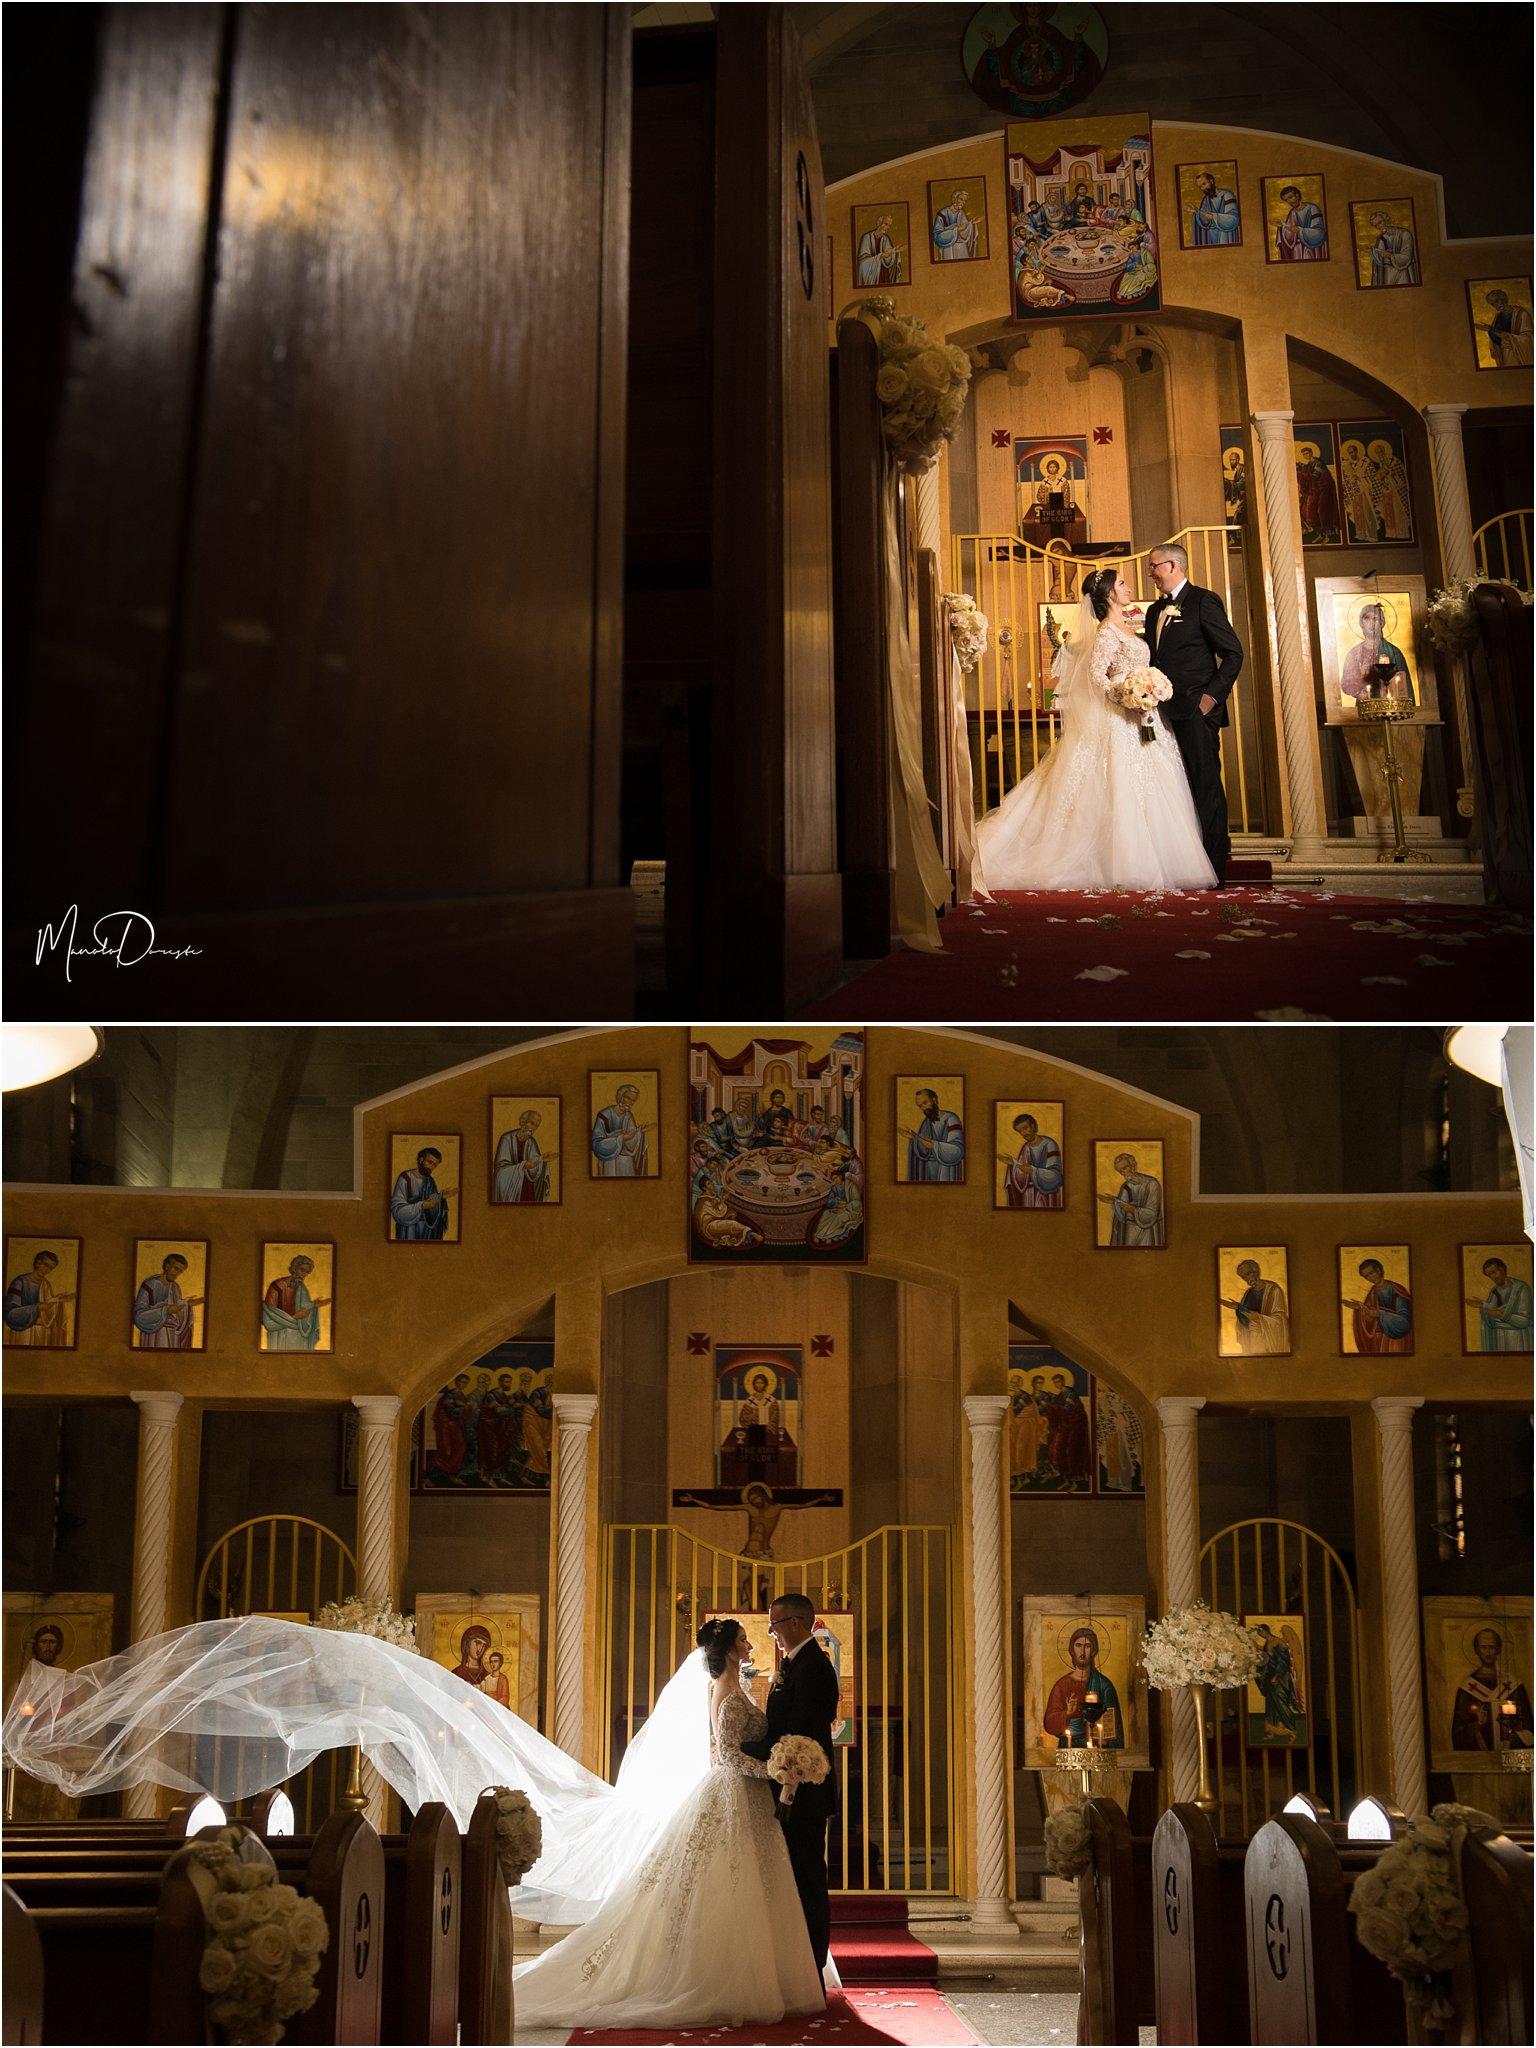 00723_ManoloDoreste_InFocusStudios_Wedding_Family_Photography_Miami_MiamiPhotographer.jpg